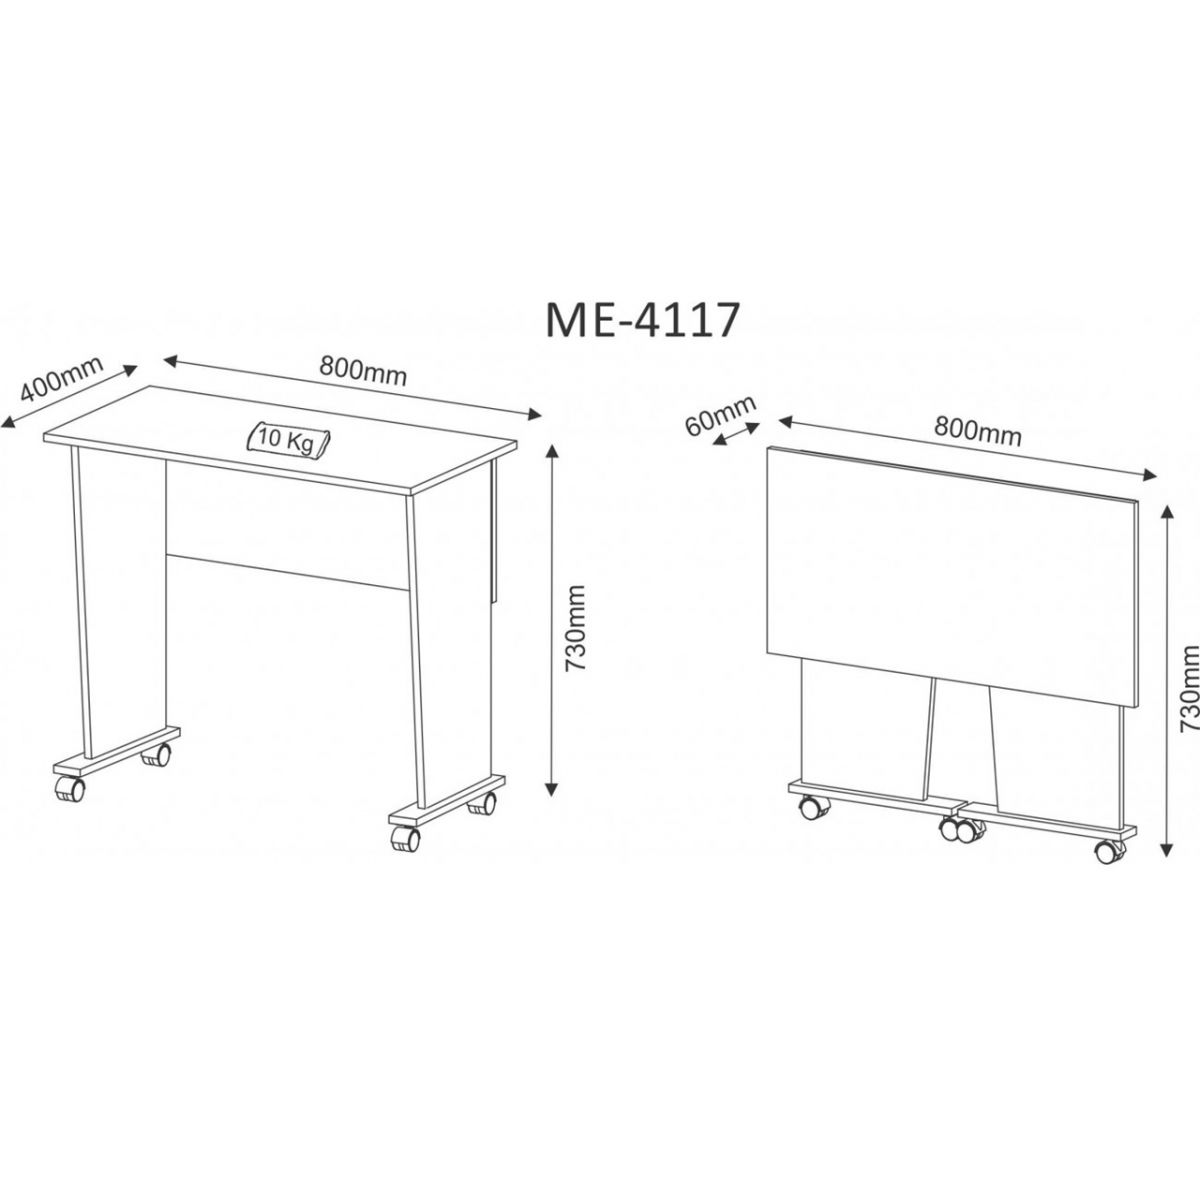 Mesa Dobrável Com Rodizio Branco ME4117 Tecno Mobili